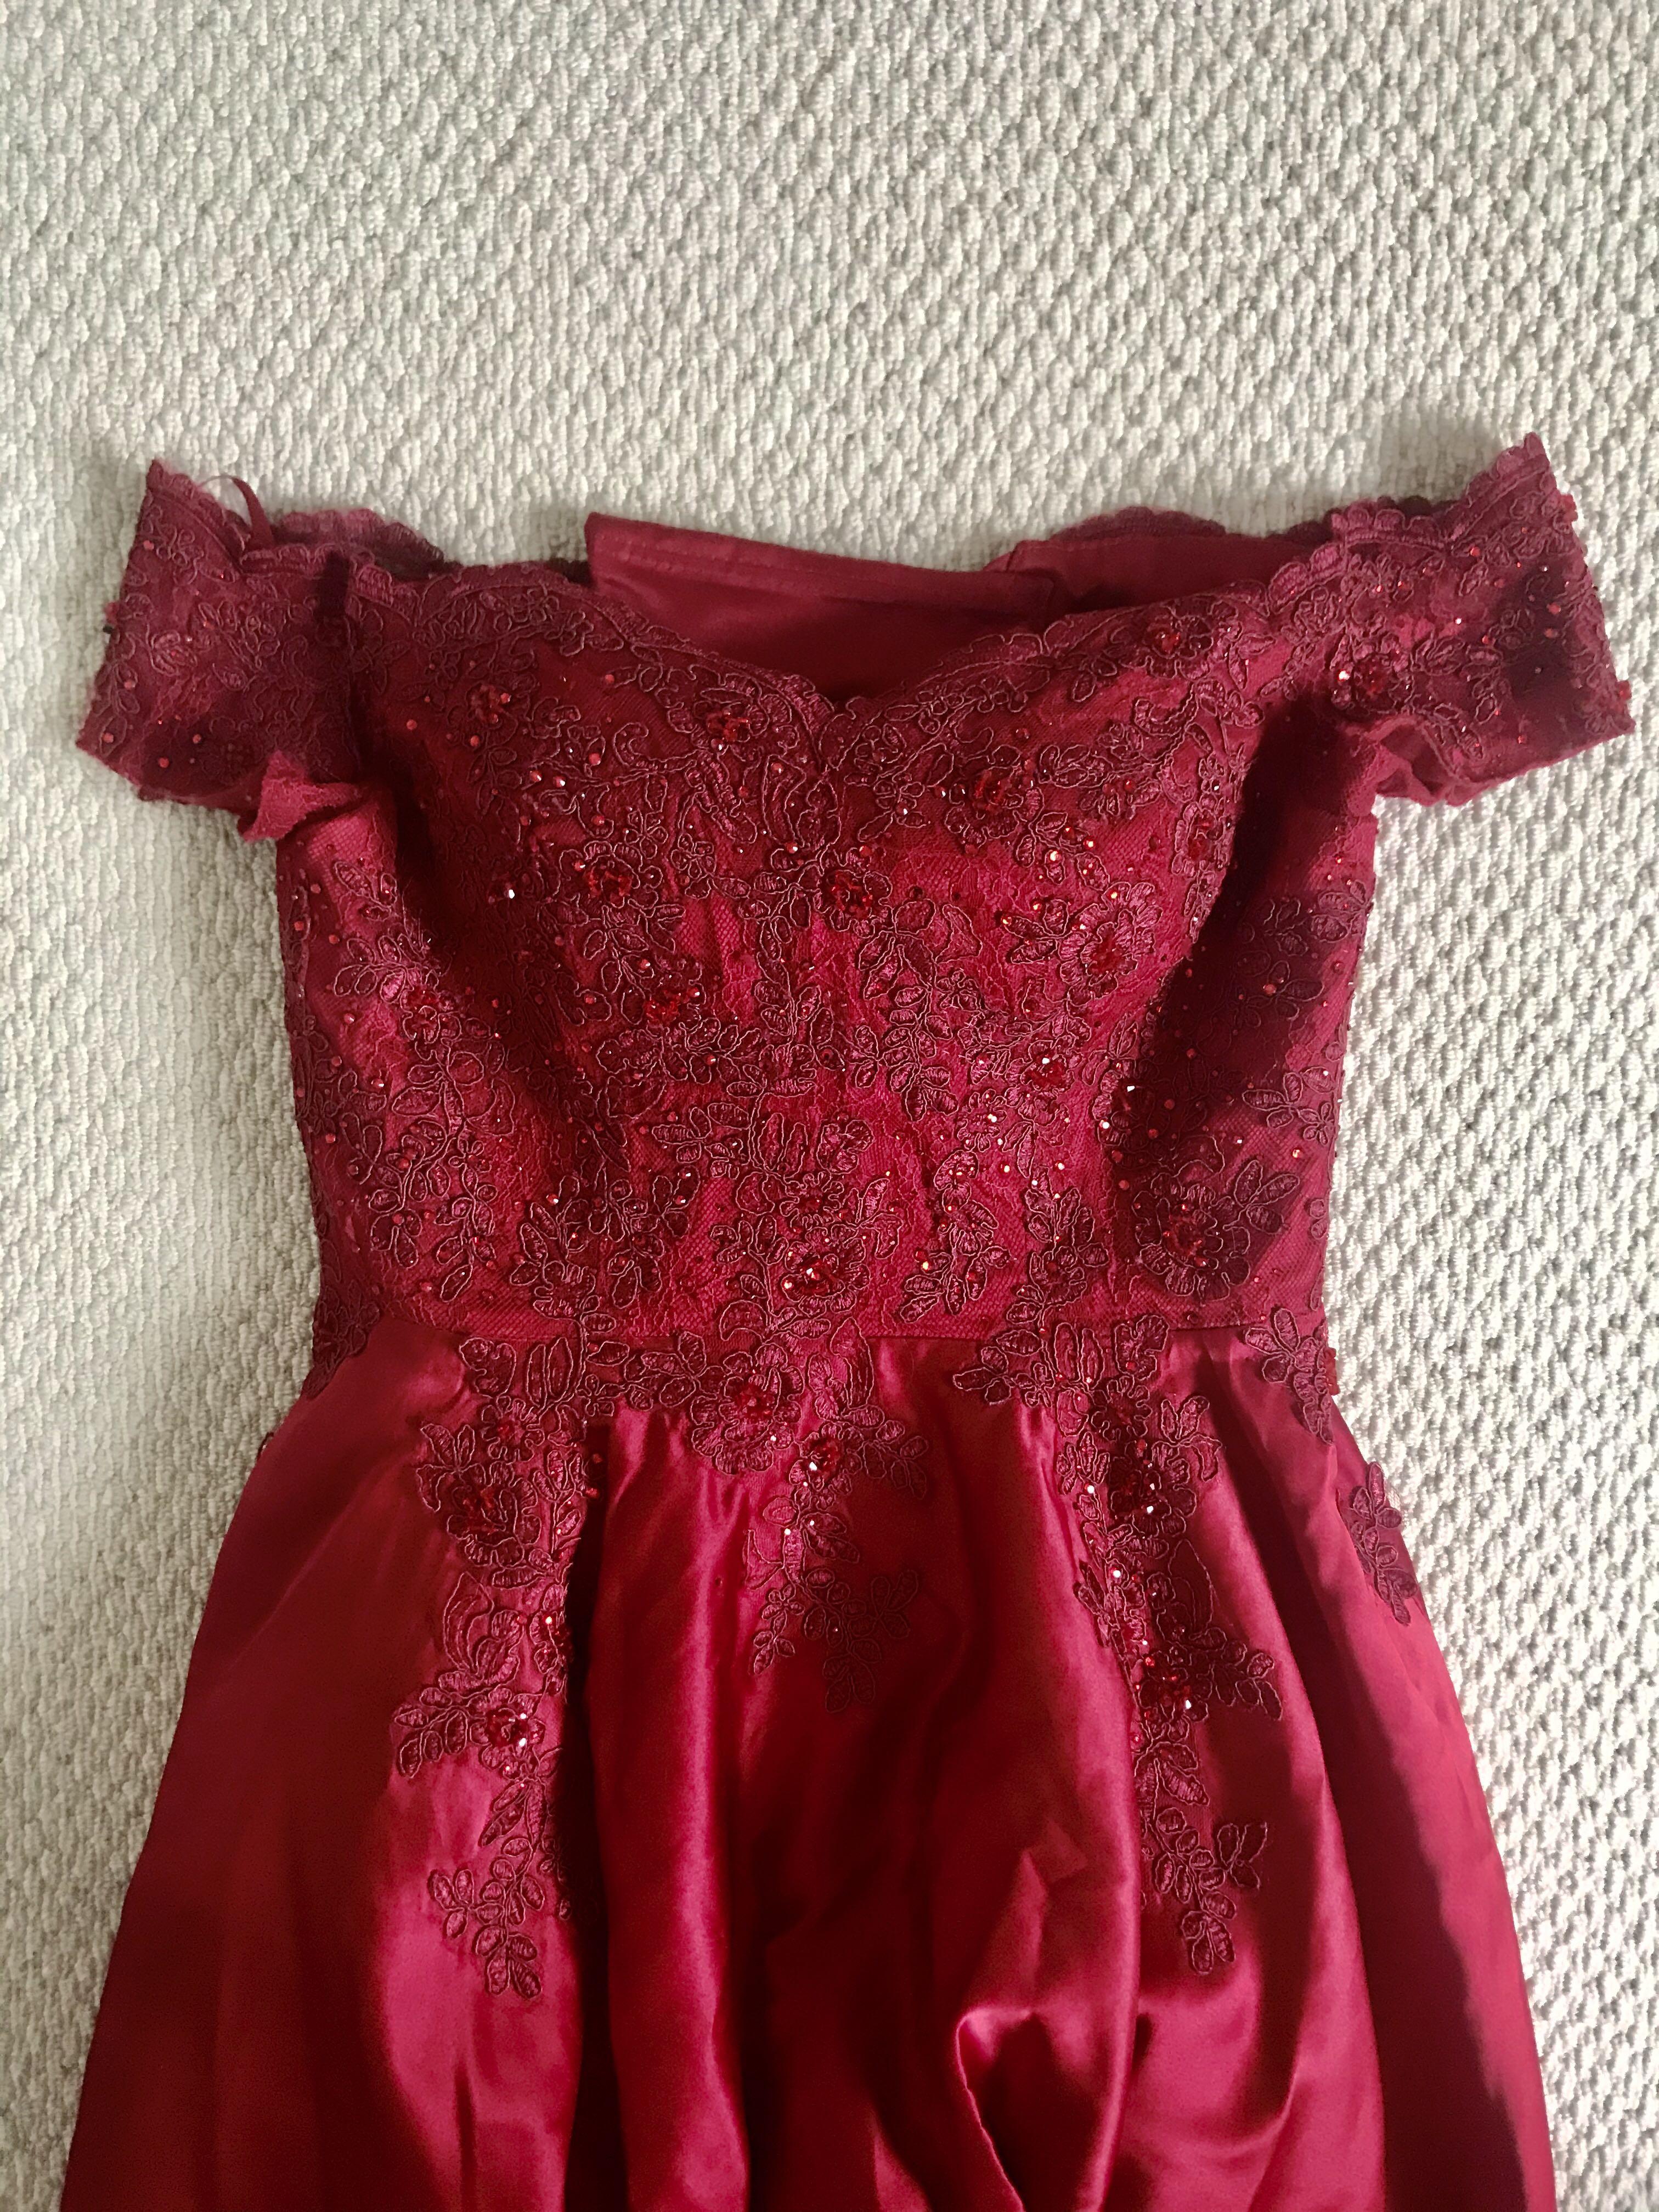 ball dress size 12-14